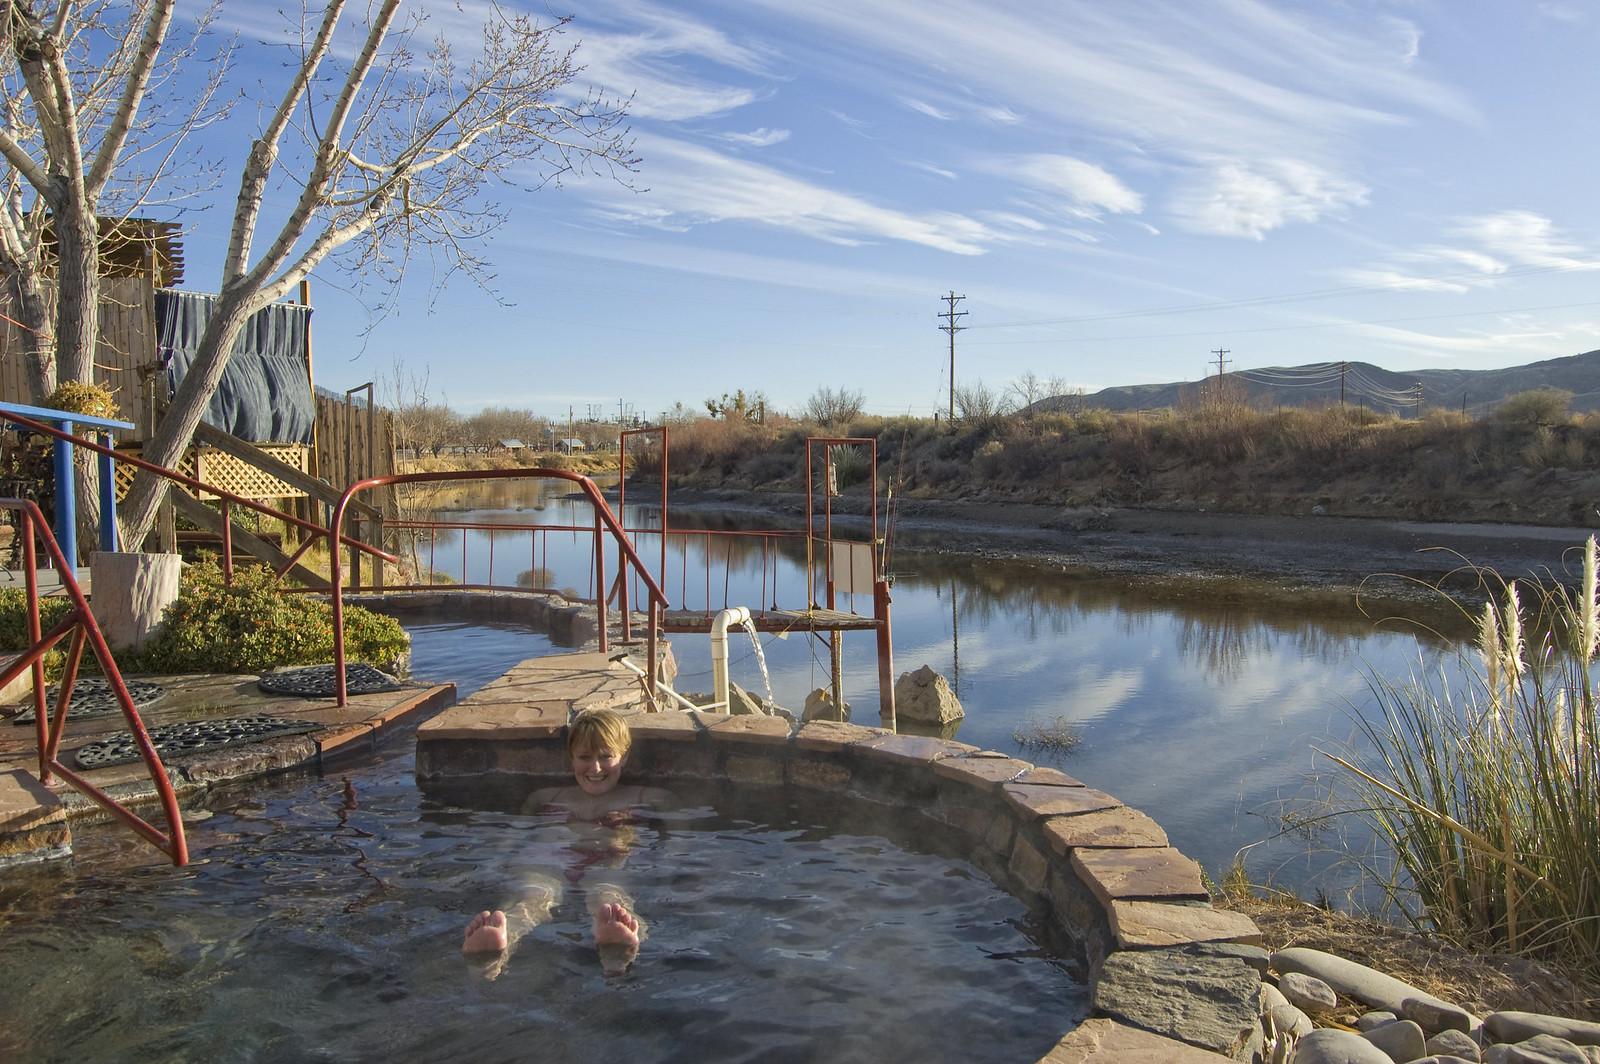 Hot Spring Spa